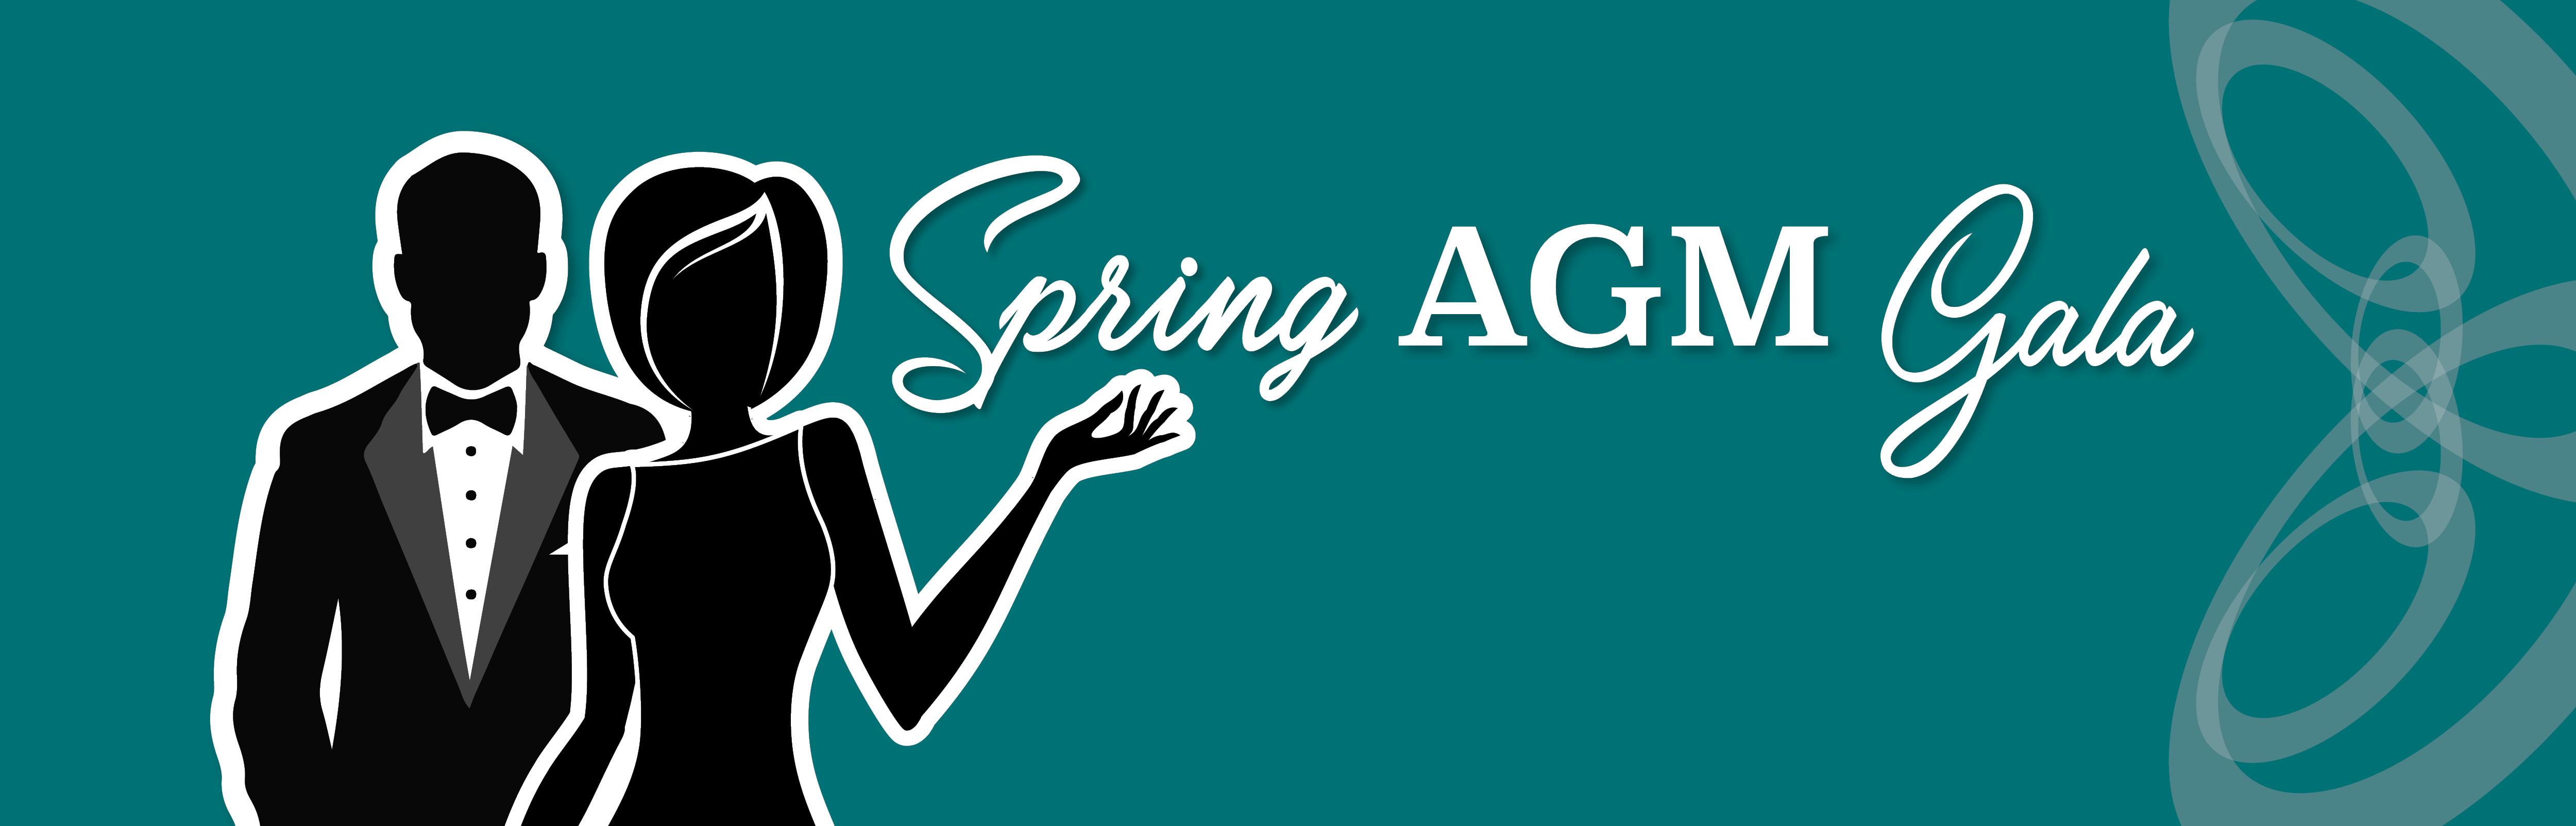 Spring AGM Gala